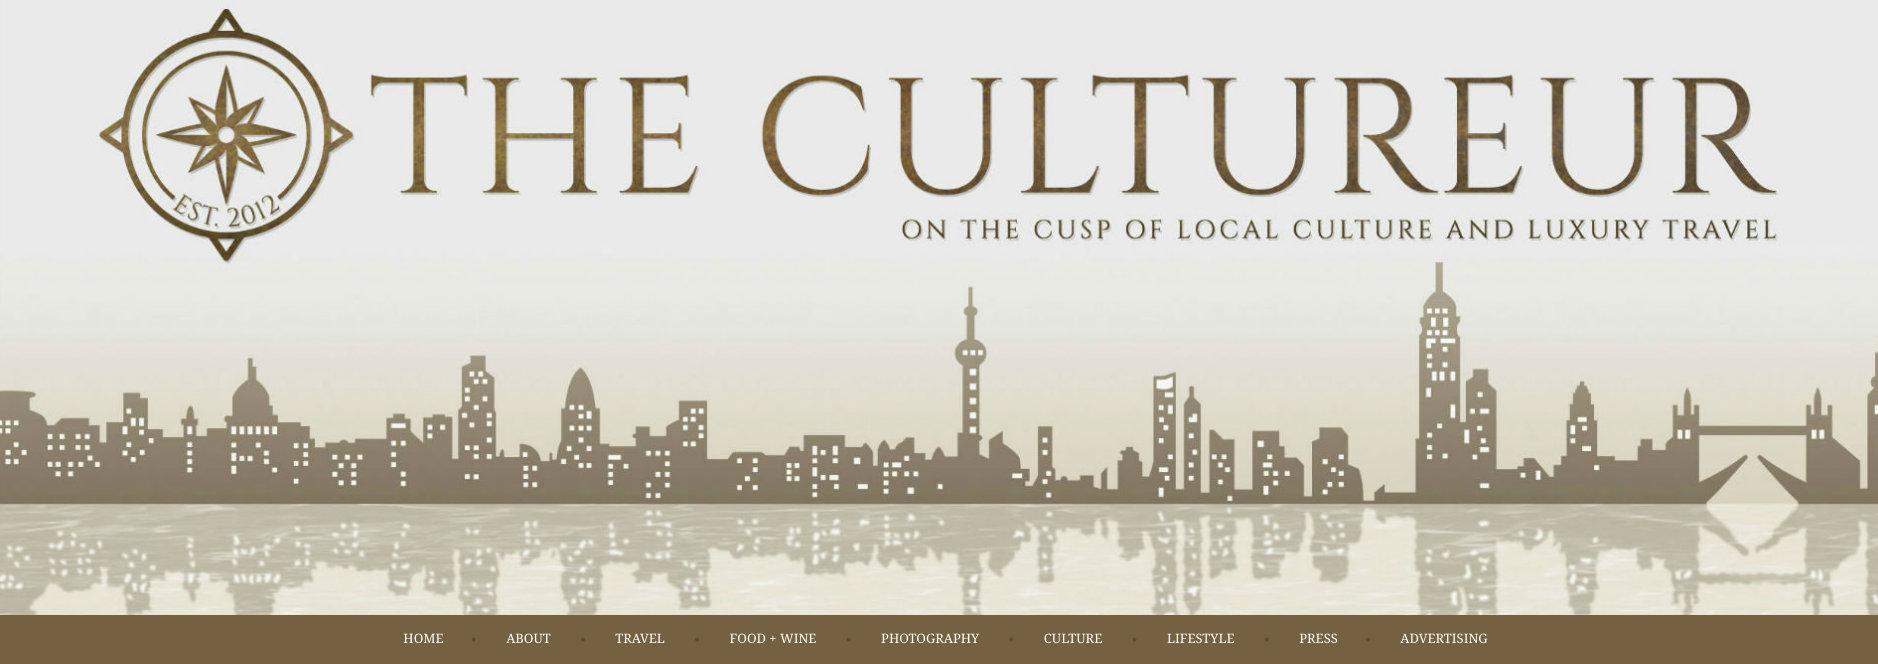 The Cultureur     www.thecutureur.com